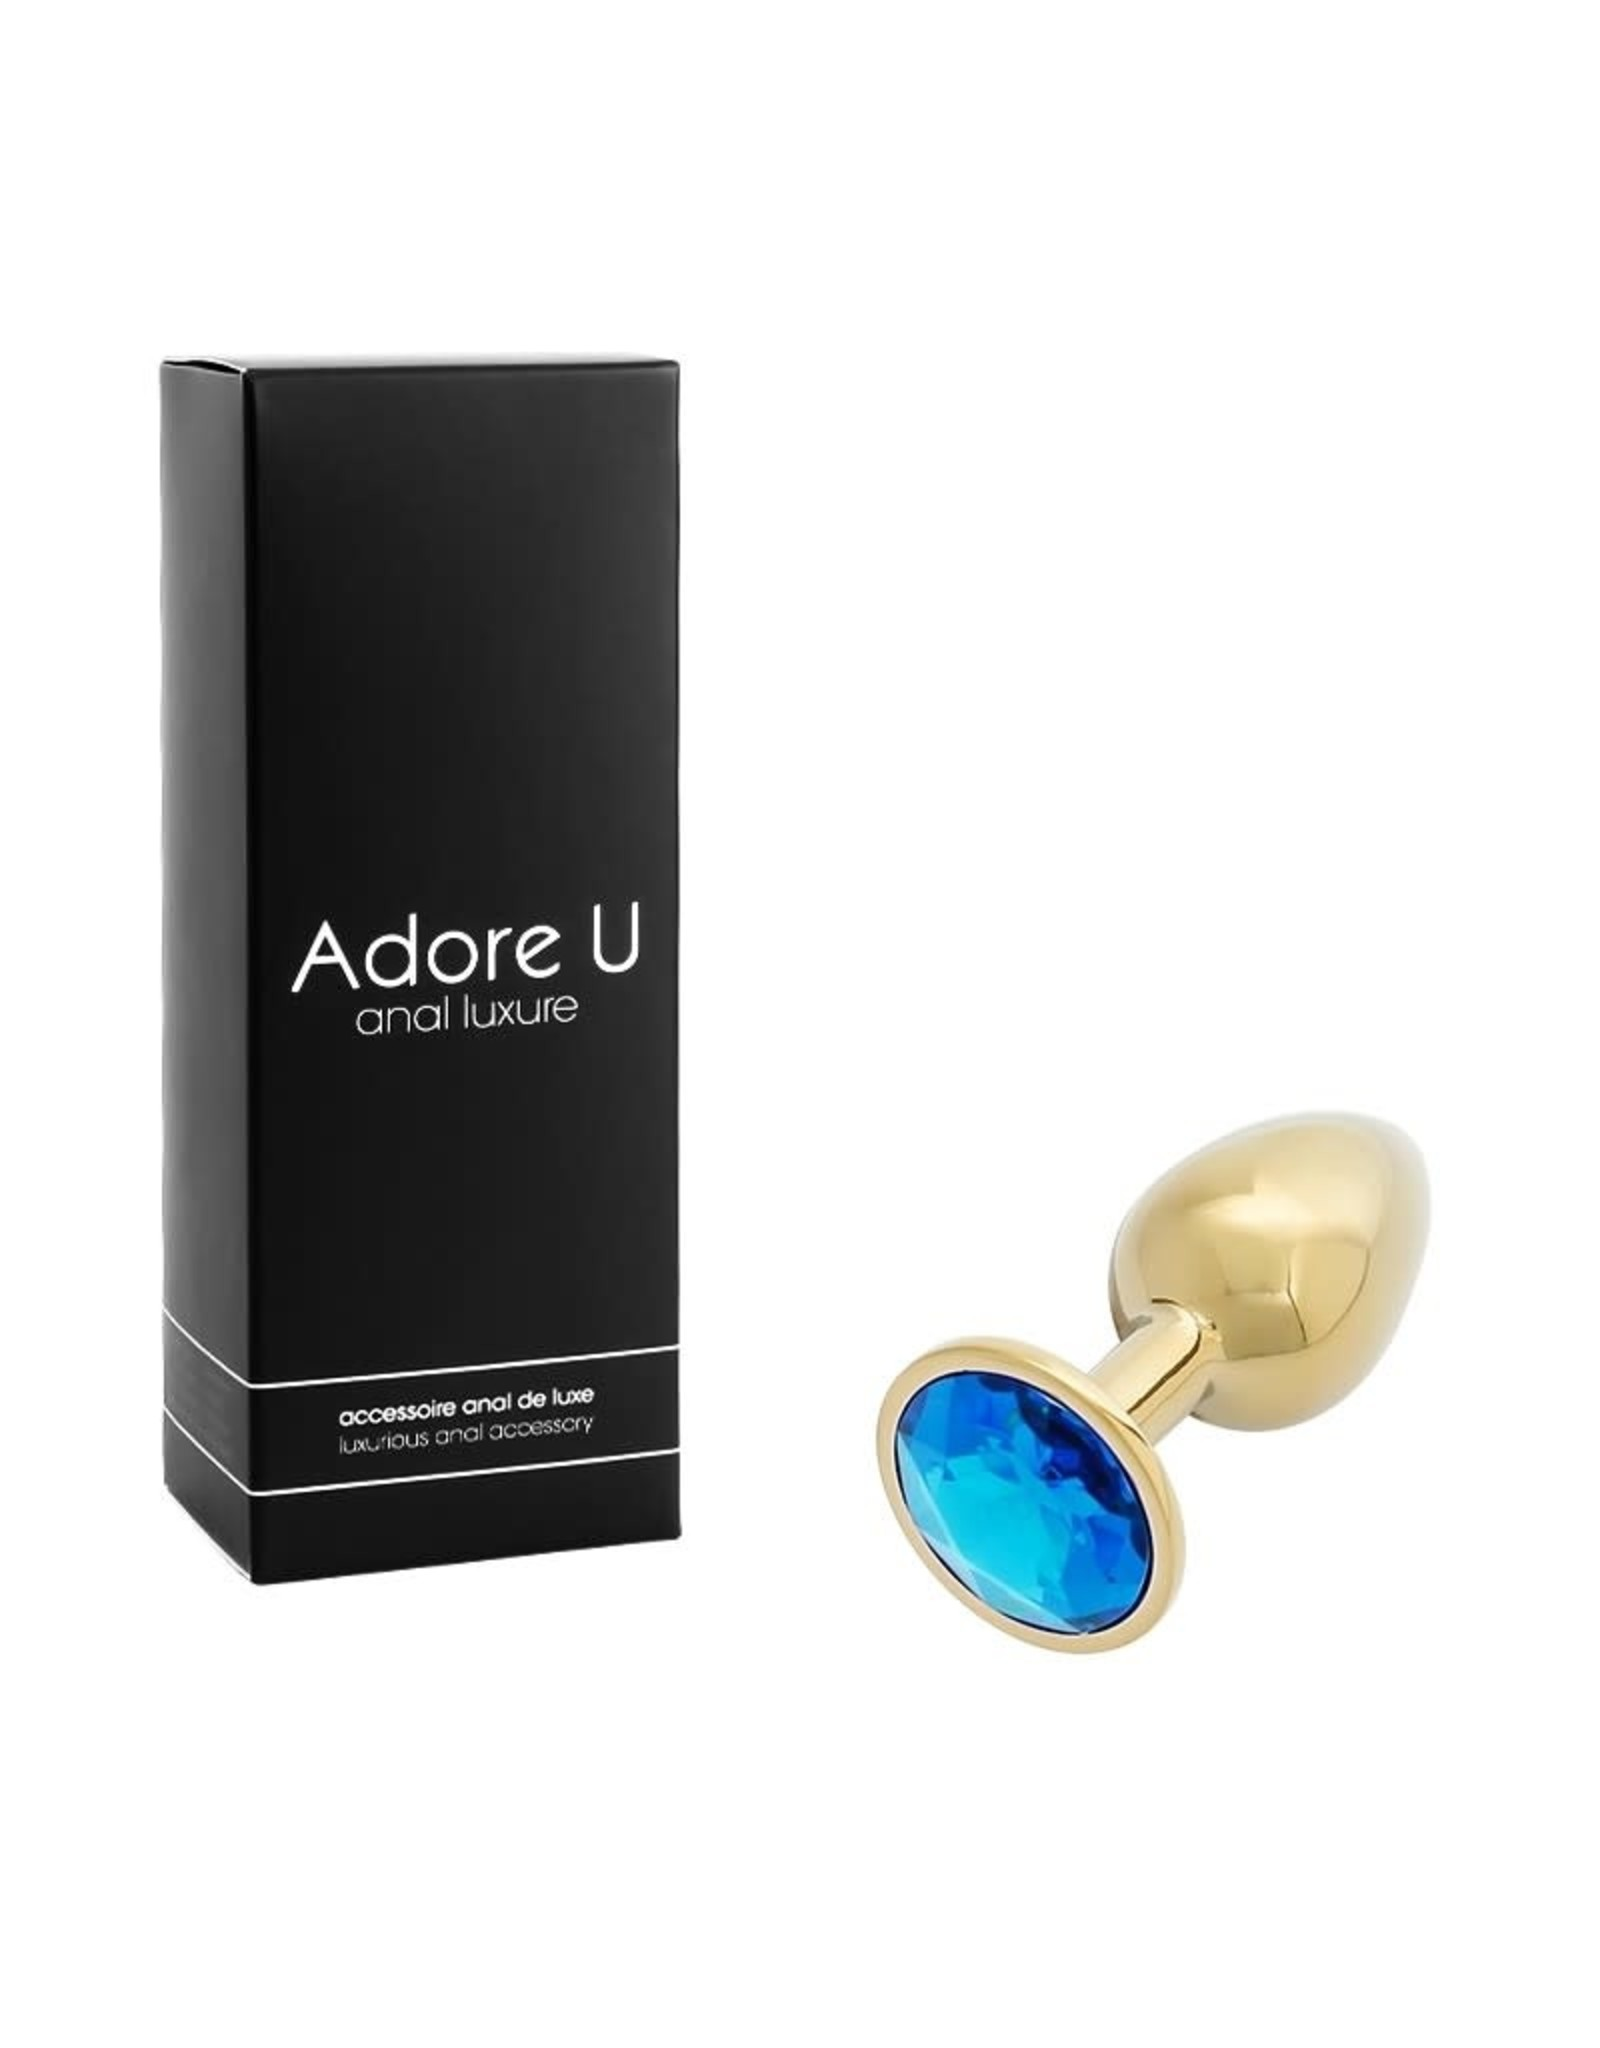 Adore U Adore U Anal Luxure Gold Small Blue